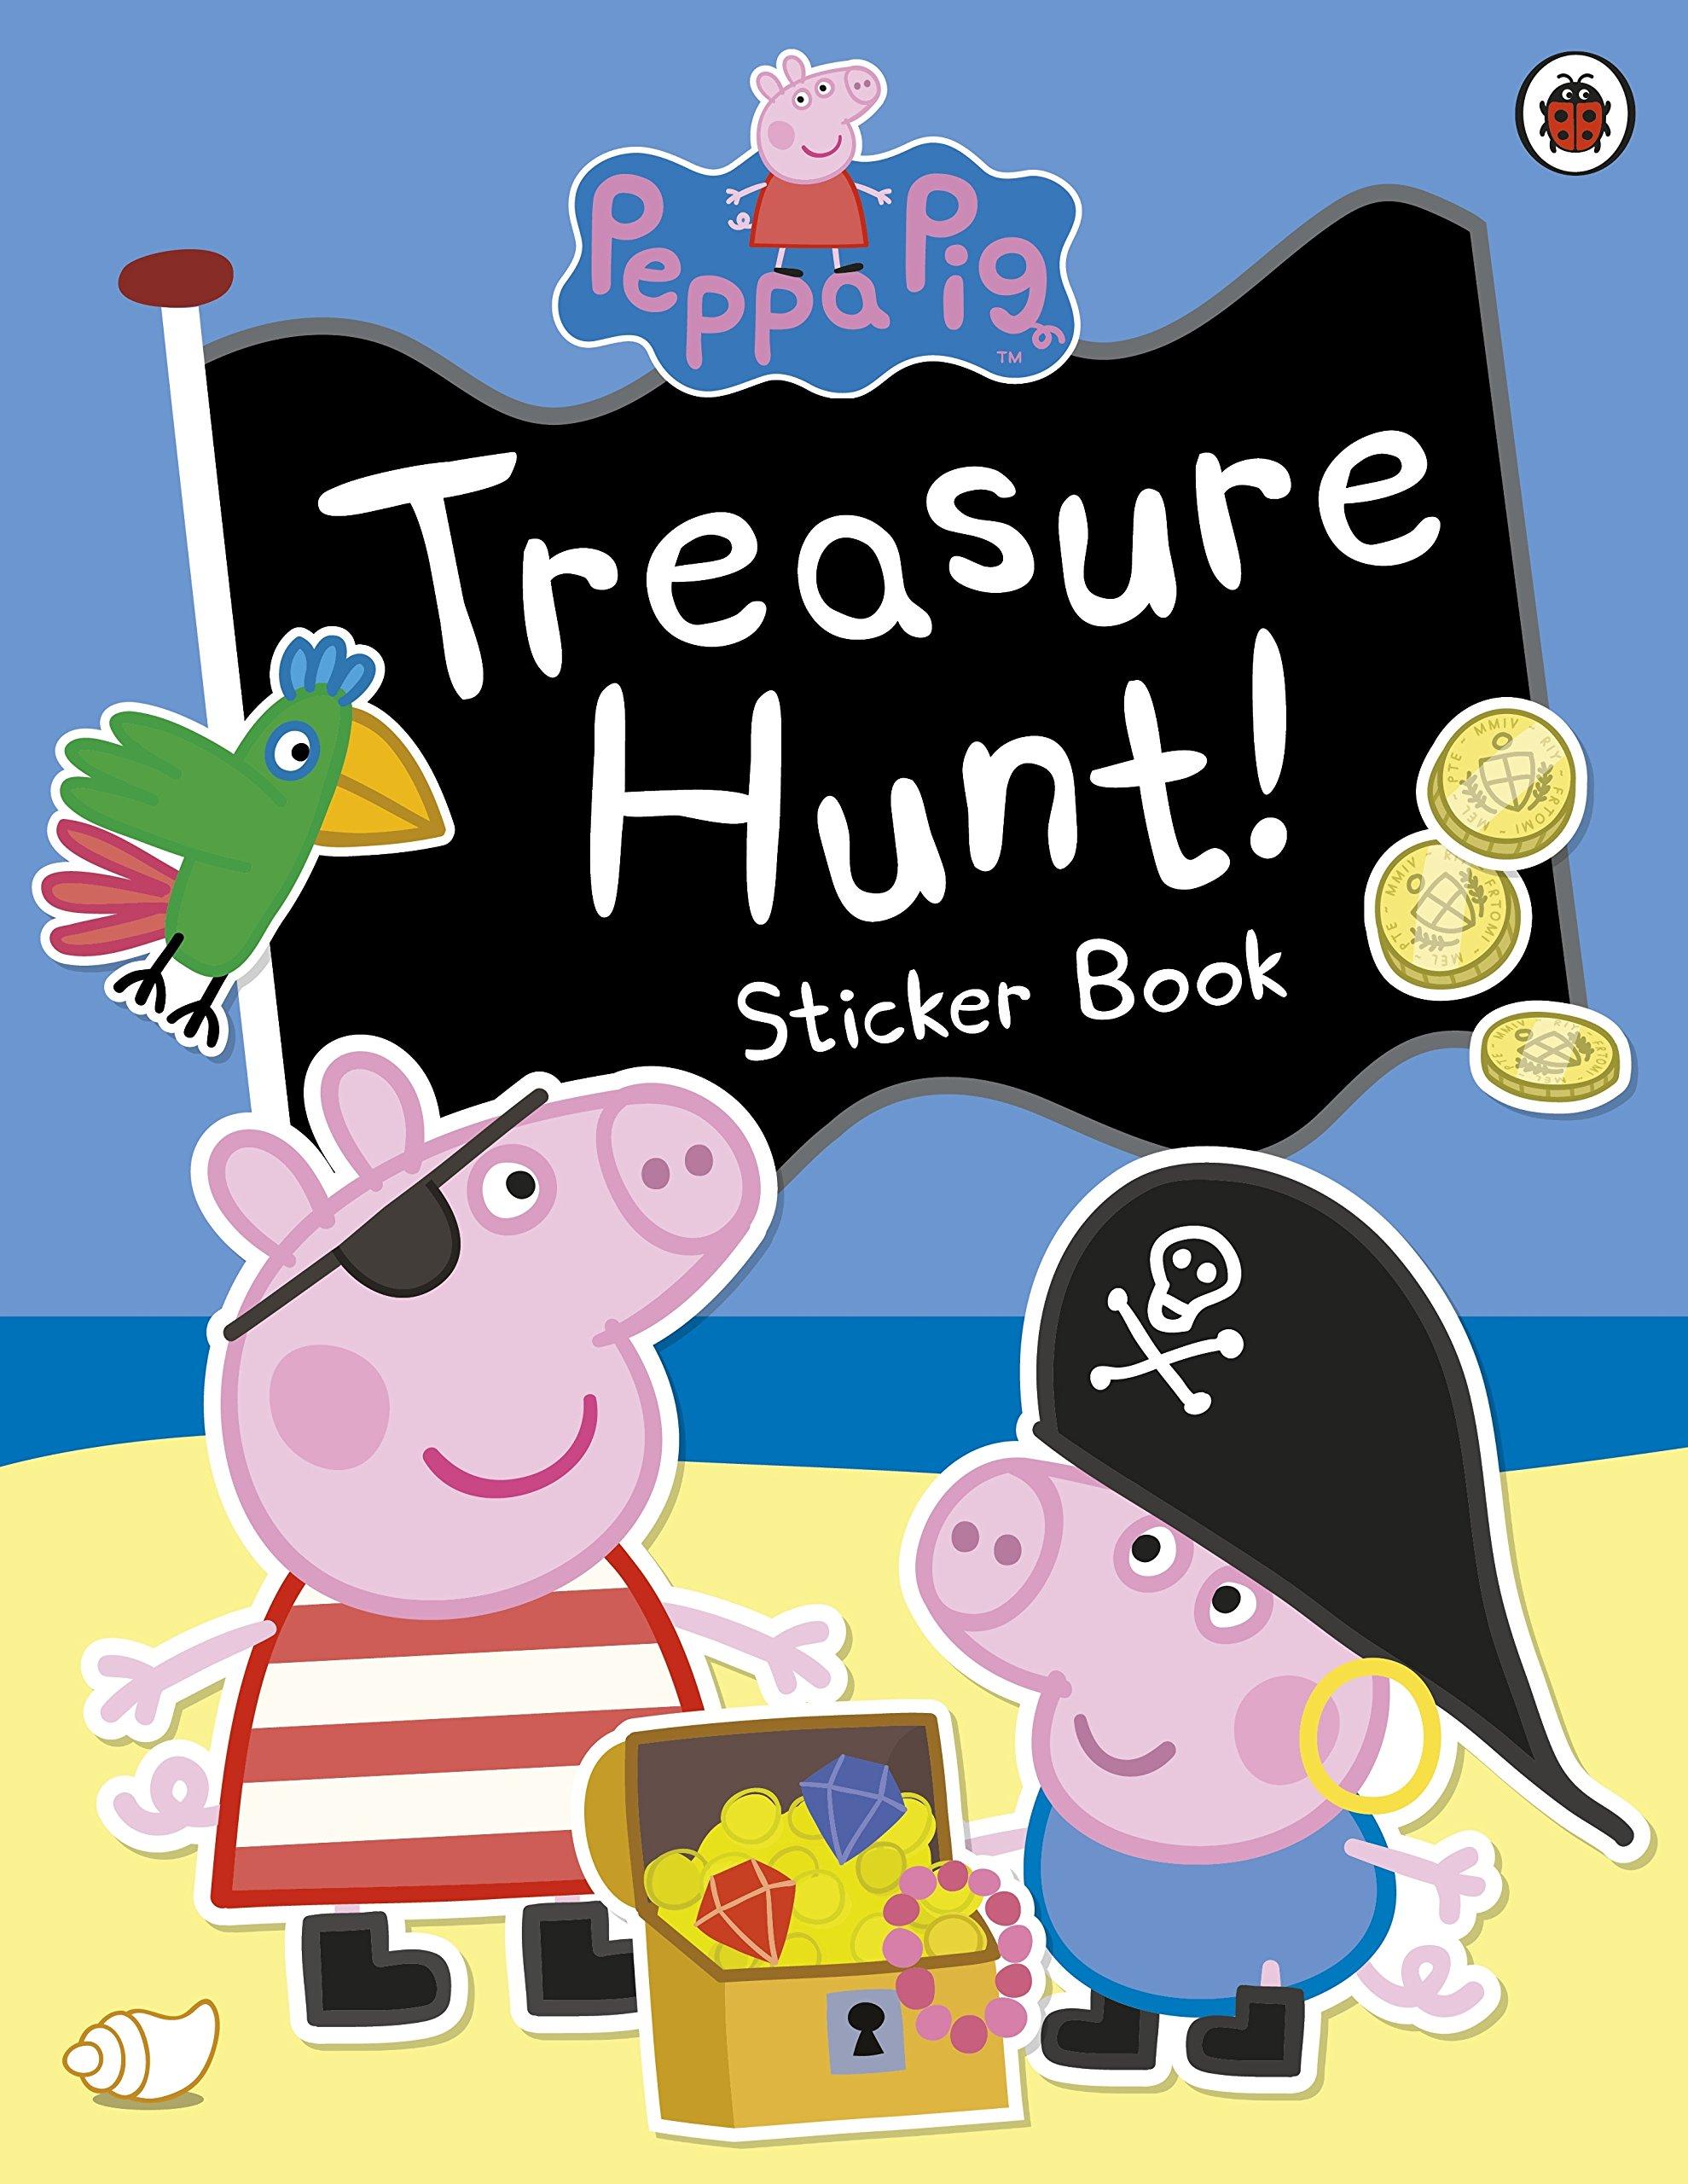 Peppa Pig: Treasure Hunt! Sticker Book PDF